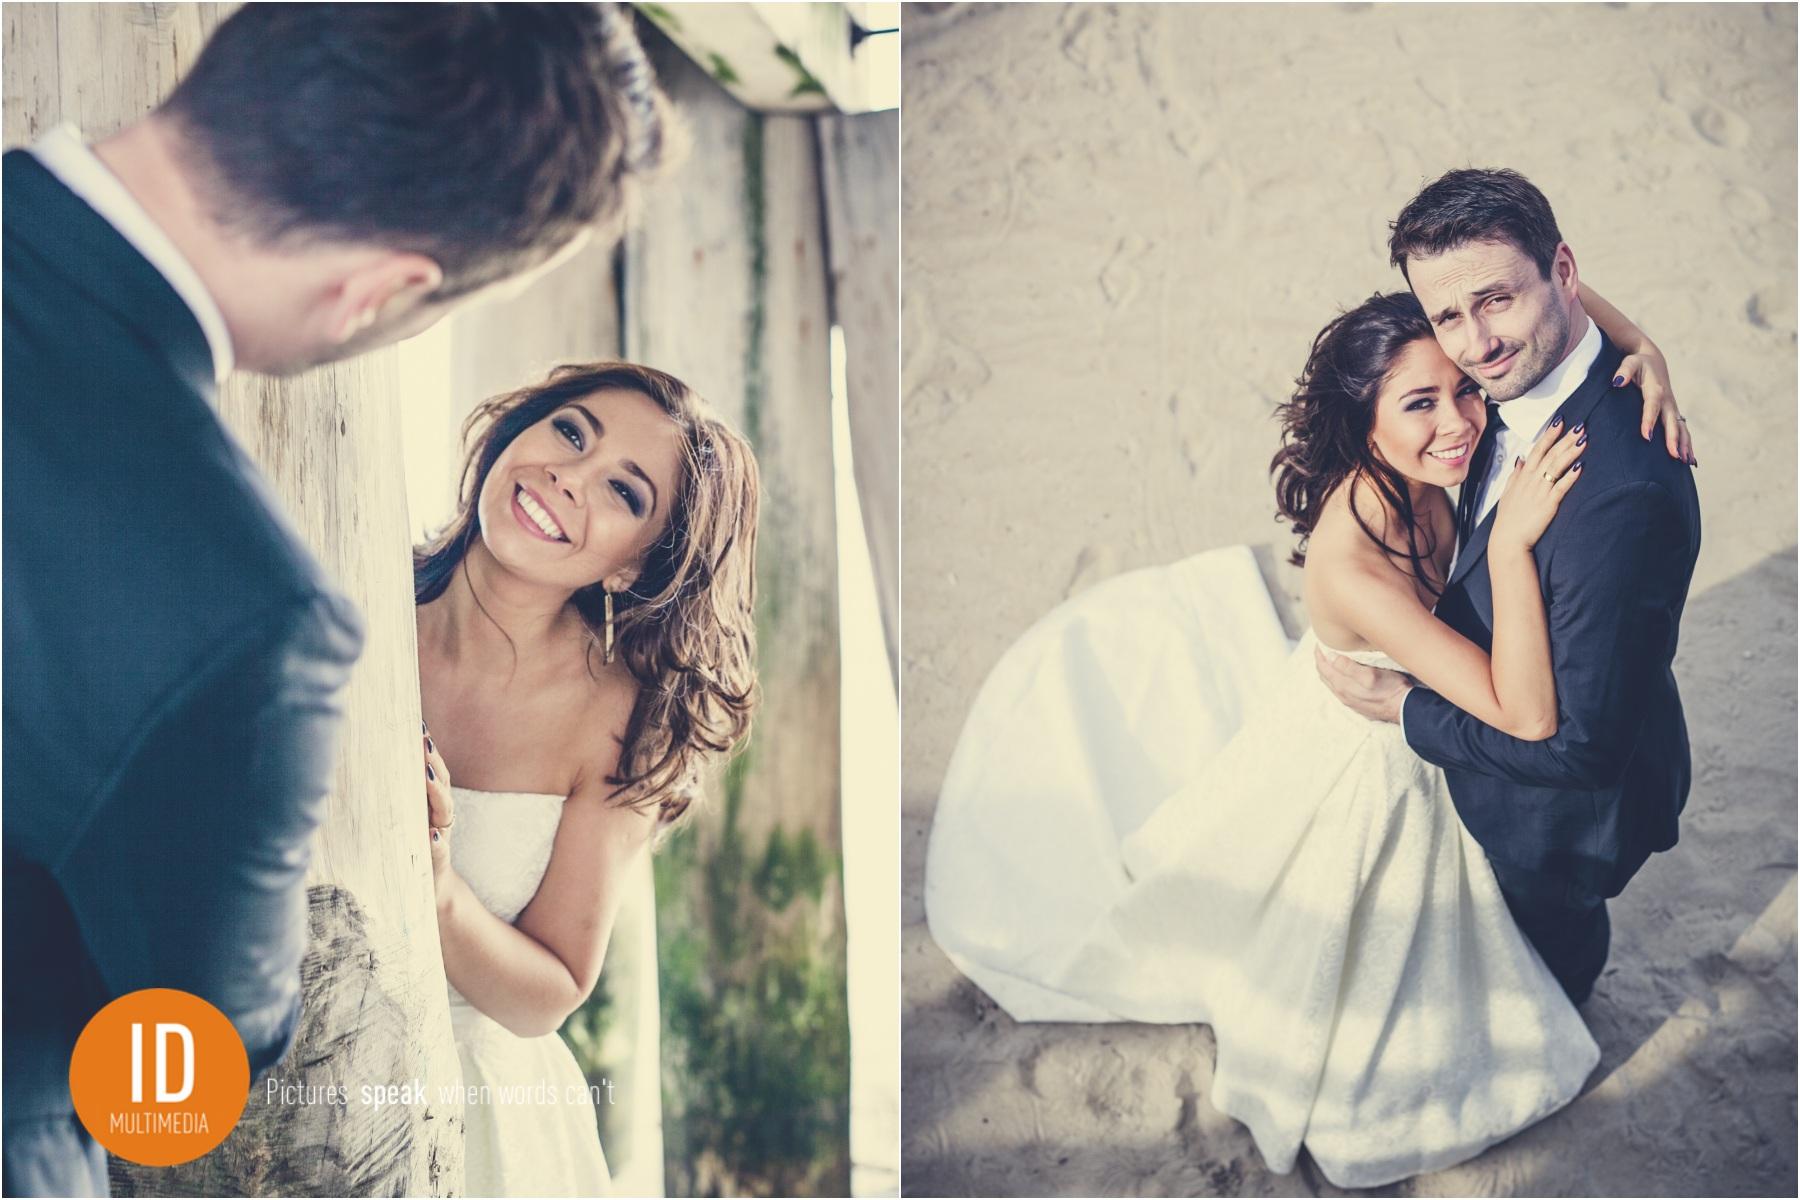 Plener ślubny Karoliny i Jacka